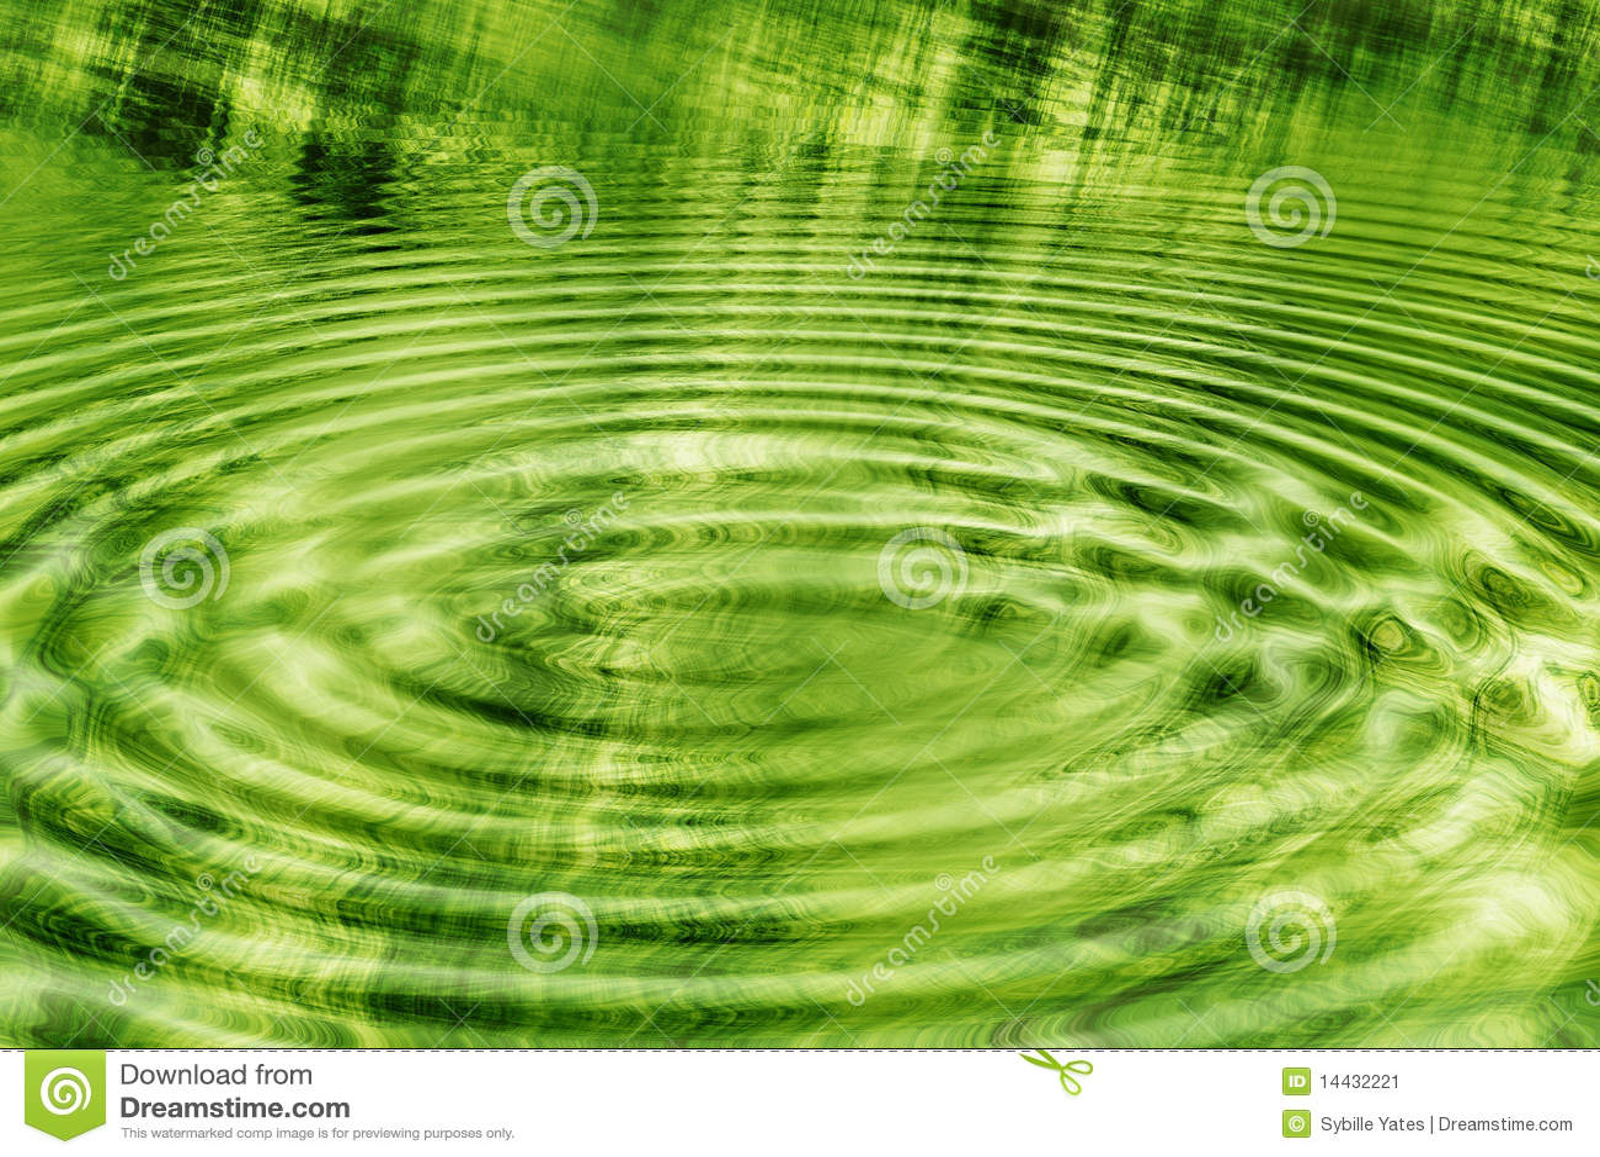 Carta da parati verde increspata del grunge immagine stock for Carta parati verde